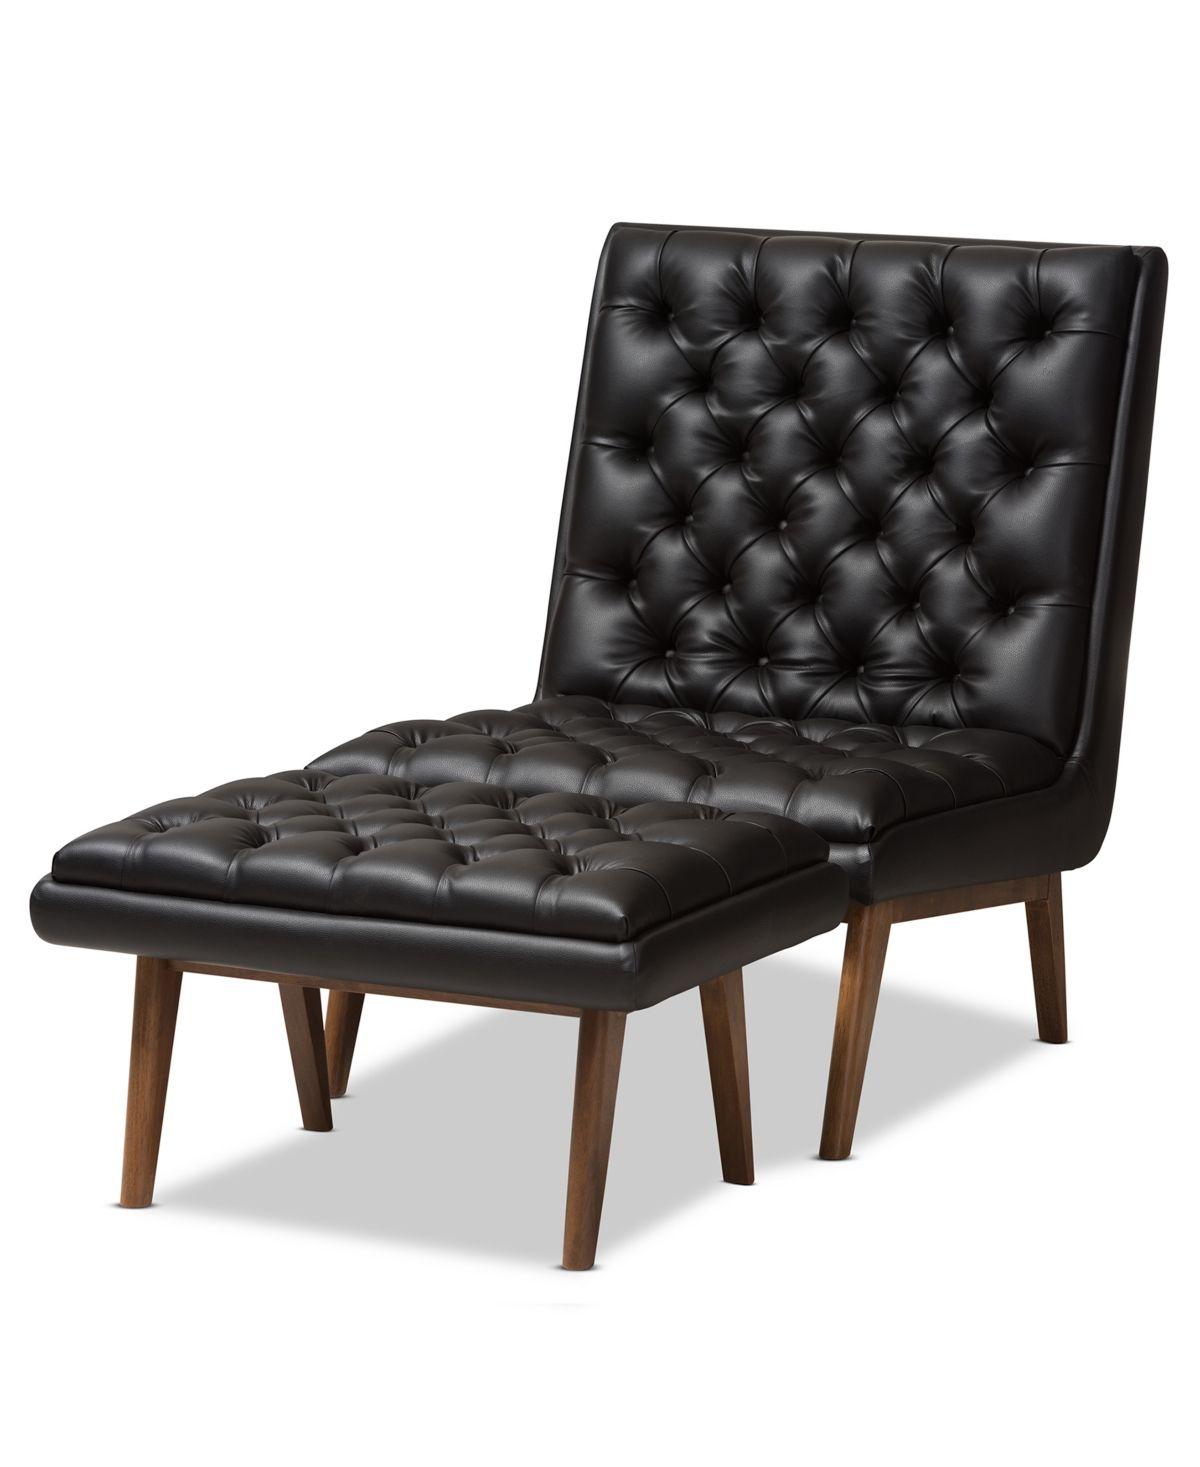 Furniture Rennate Chair Amp Ottoman Set Amp Reviews Chairs